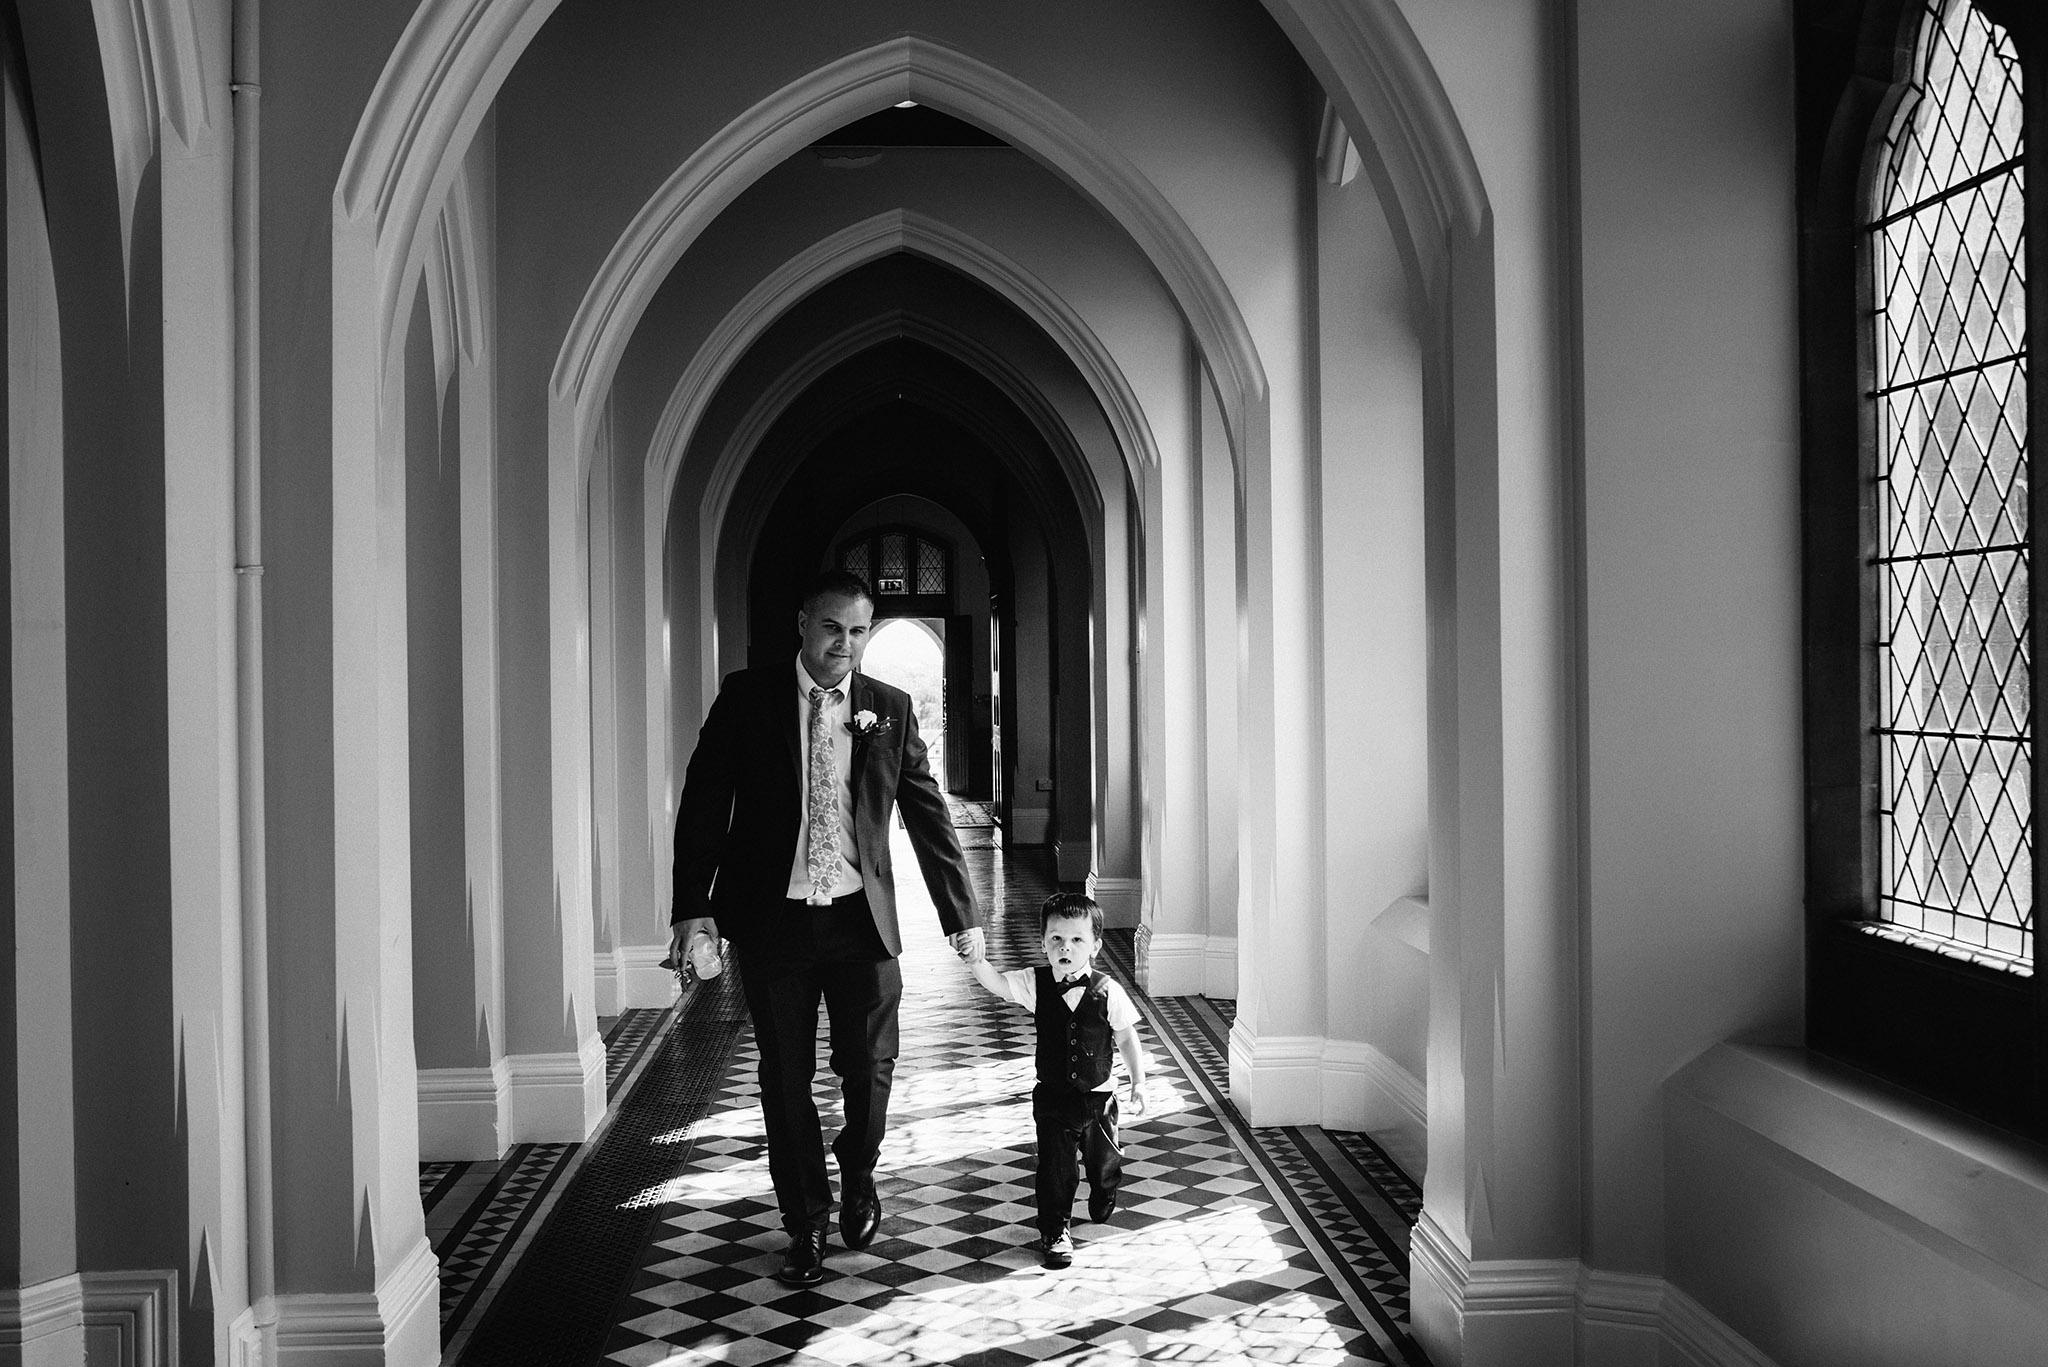 scott-stockwell-photography-wedding-23.jpg